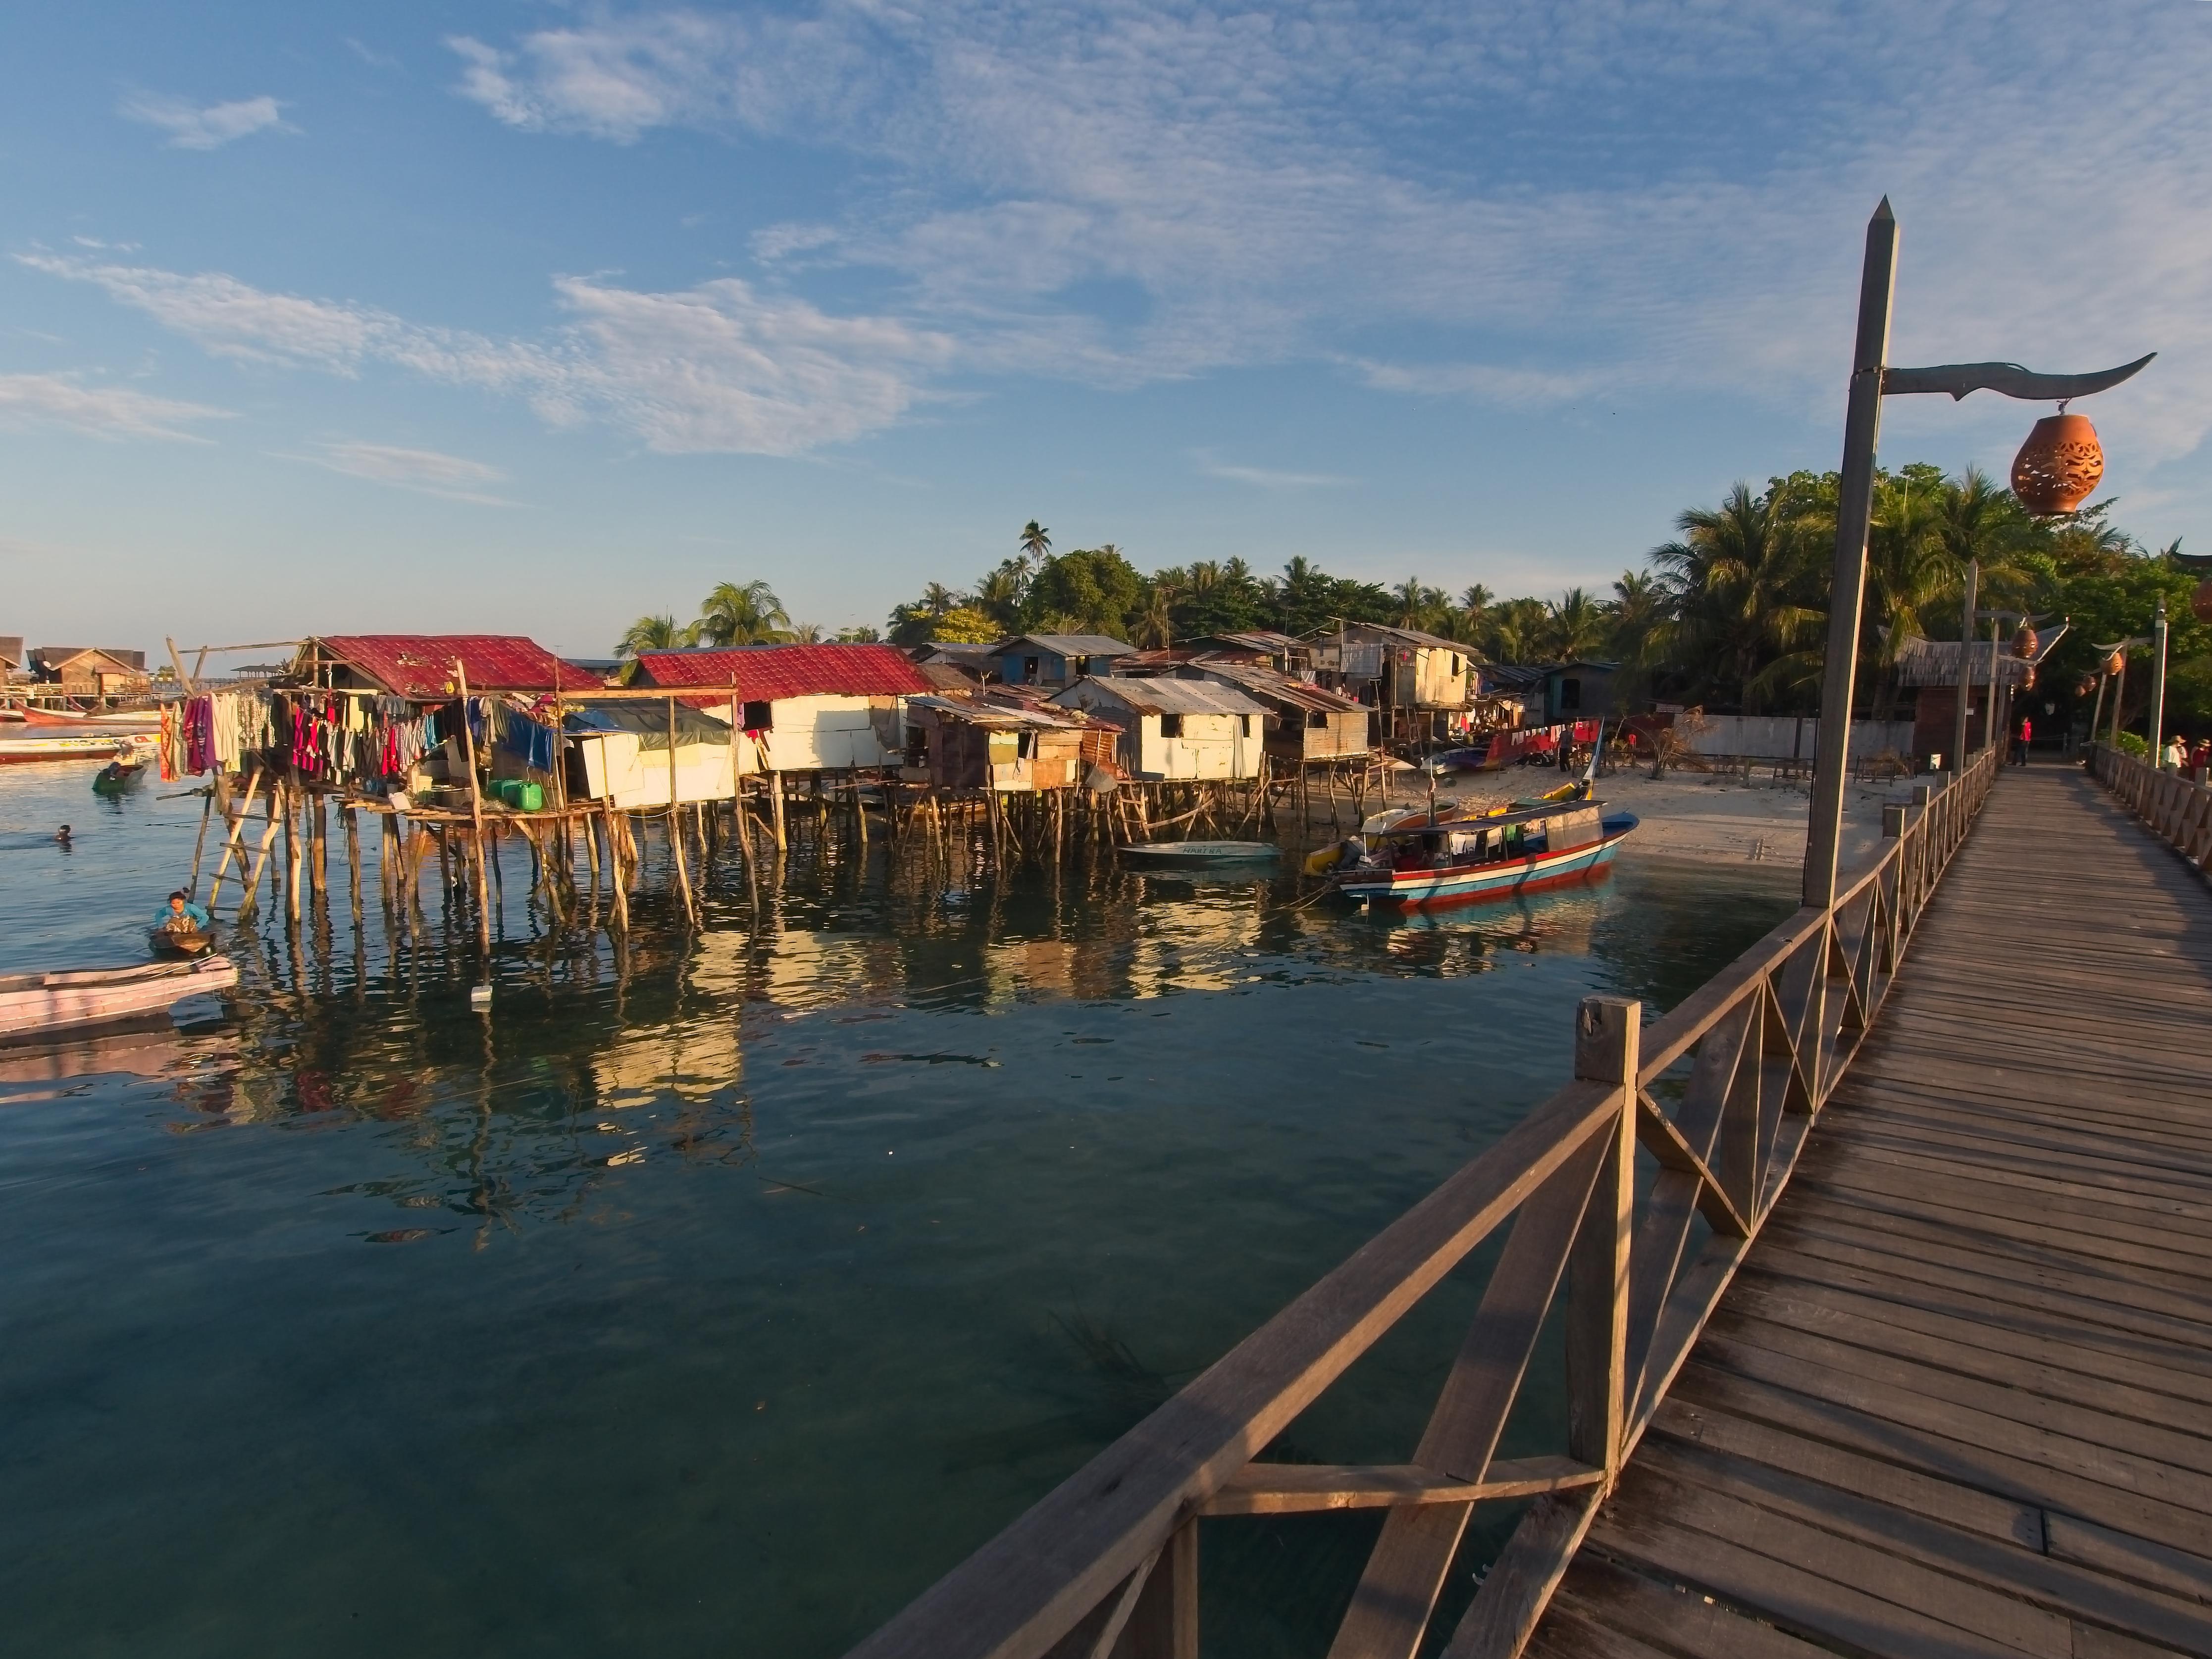 1 maand backpacken in Maleisië: Duiken bij Mabul, Kapalai & Sipadan